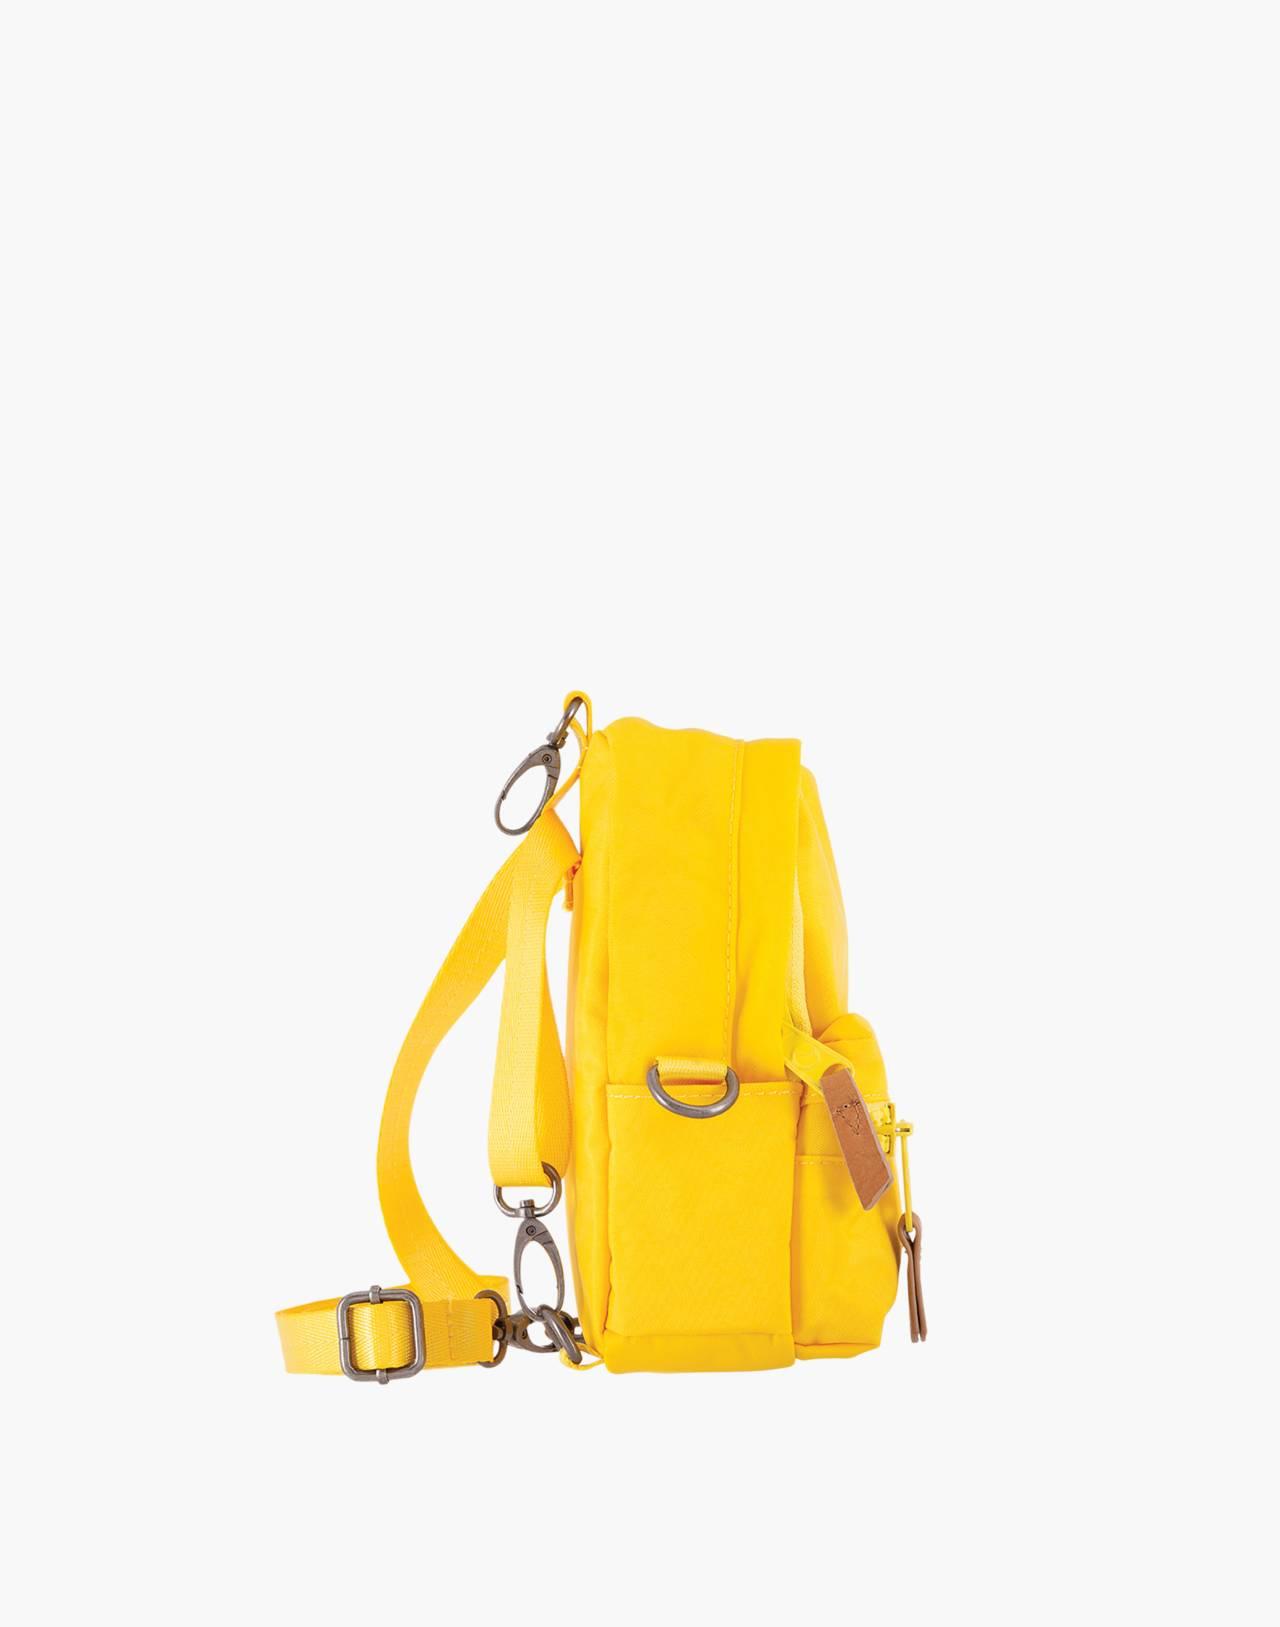 LOLA™ Mondo Stargazer Mini Convertible Backpack in yellow image 3